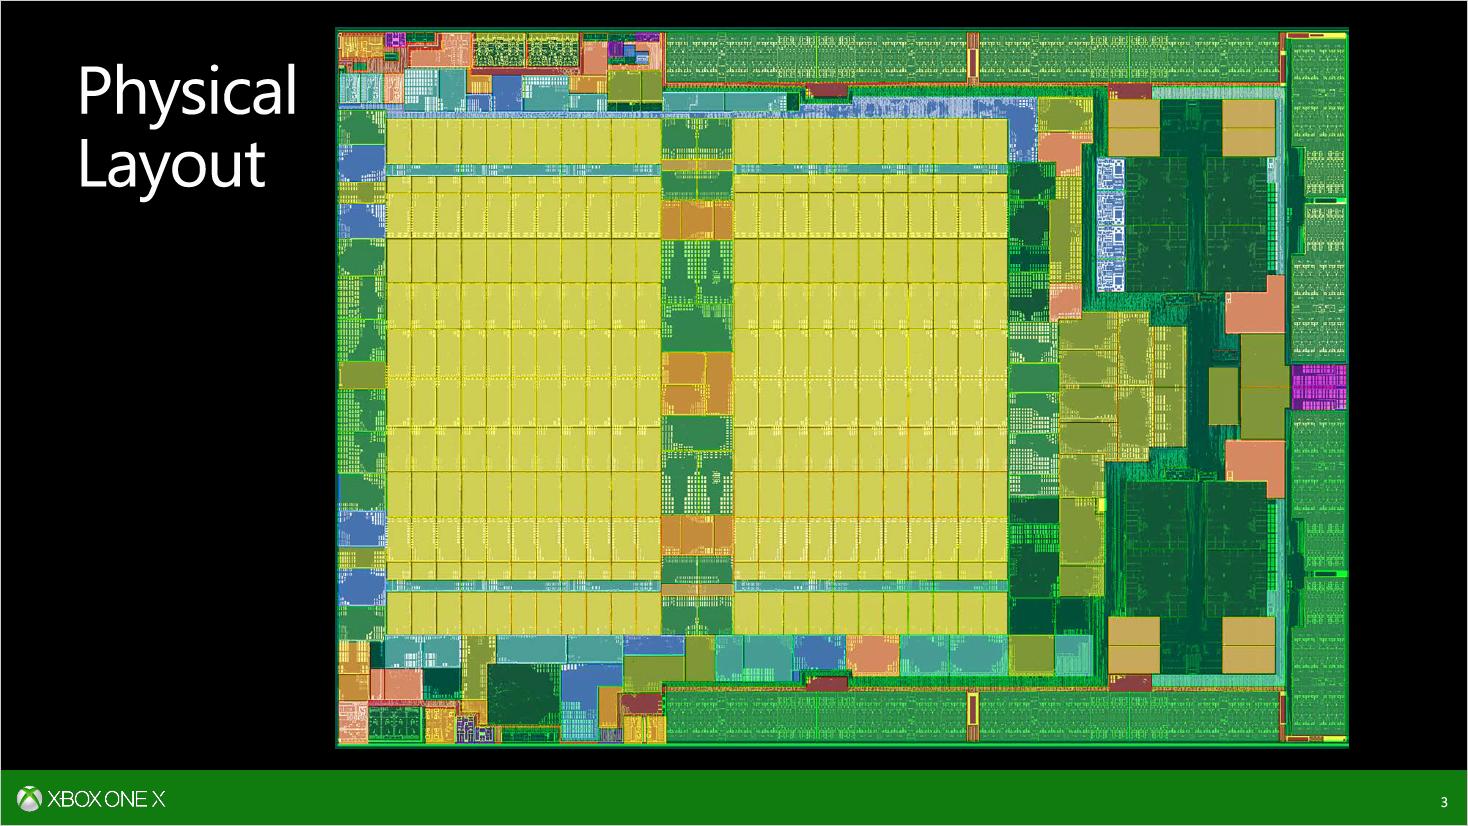 Scorpio Engine: Microsoft erläutert SoC der Xbox One X - Die-Shot der Scorpio-Engine (Bild: Microsoft)